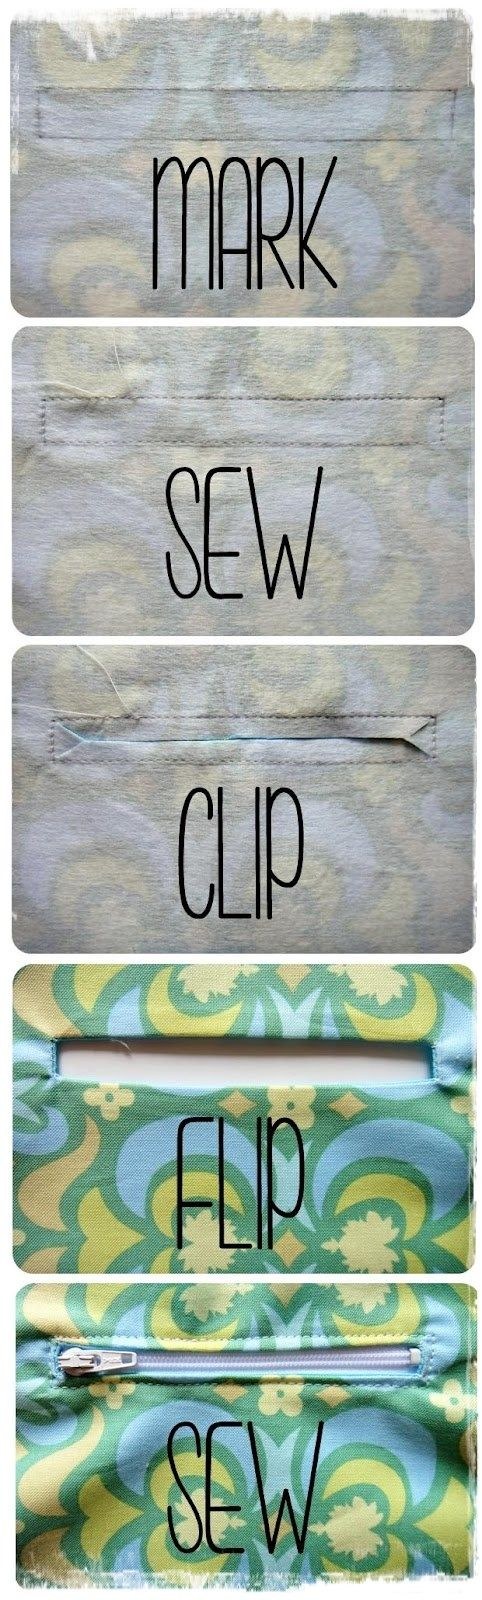 How To Sew A Pocket Zipper | DIY & Craft Ideas